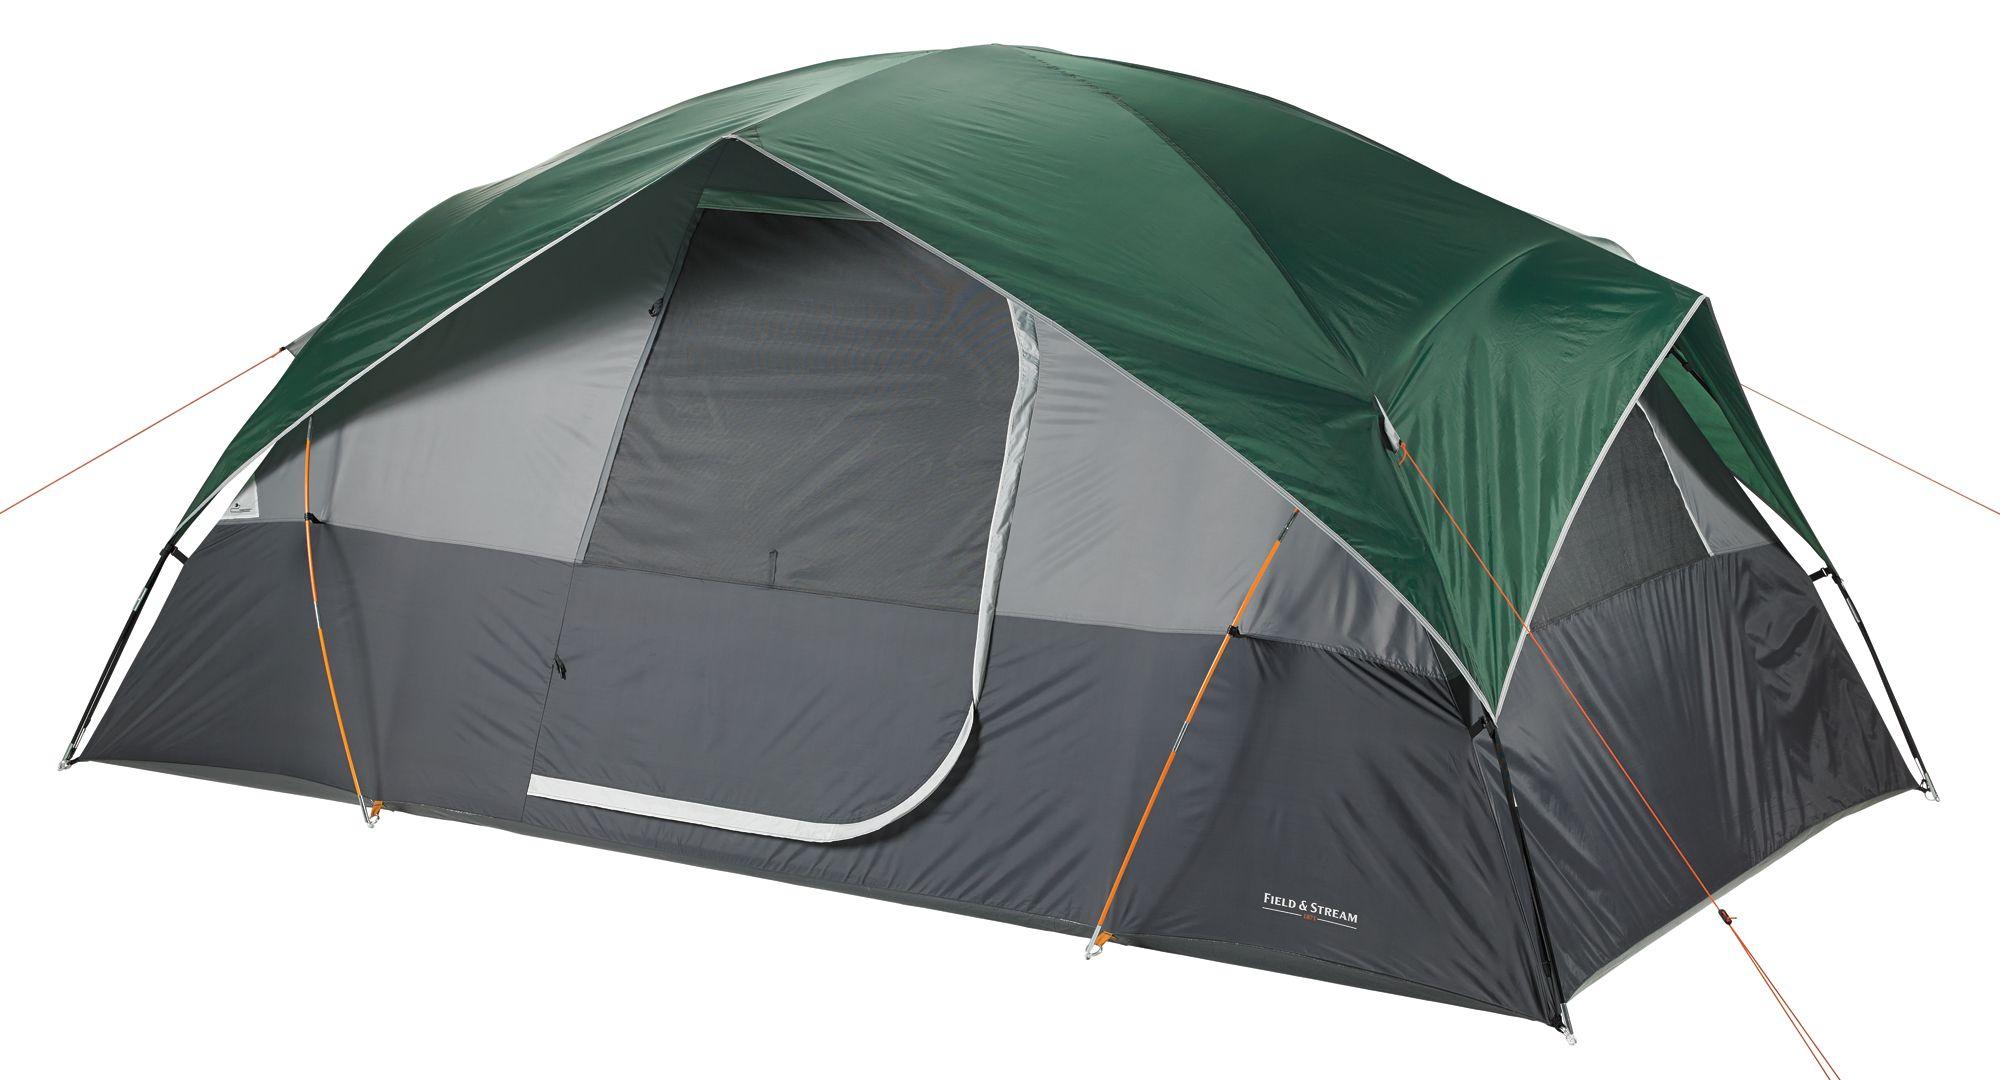 Field u0026 Stream Cross Vent 8-Person Tent 1  sc 1 st  Field u0026 Stream & Field u0026 Stream Cross Vent 8-Person Tent | Field u0026 Stream